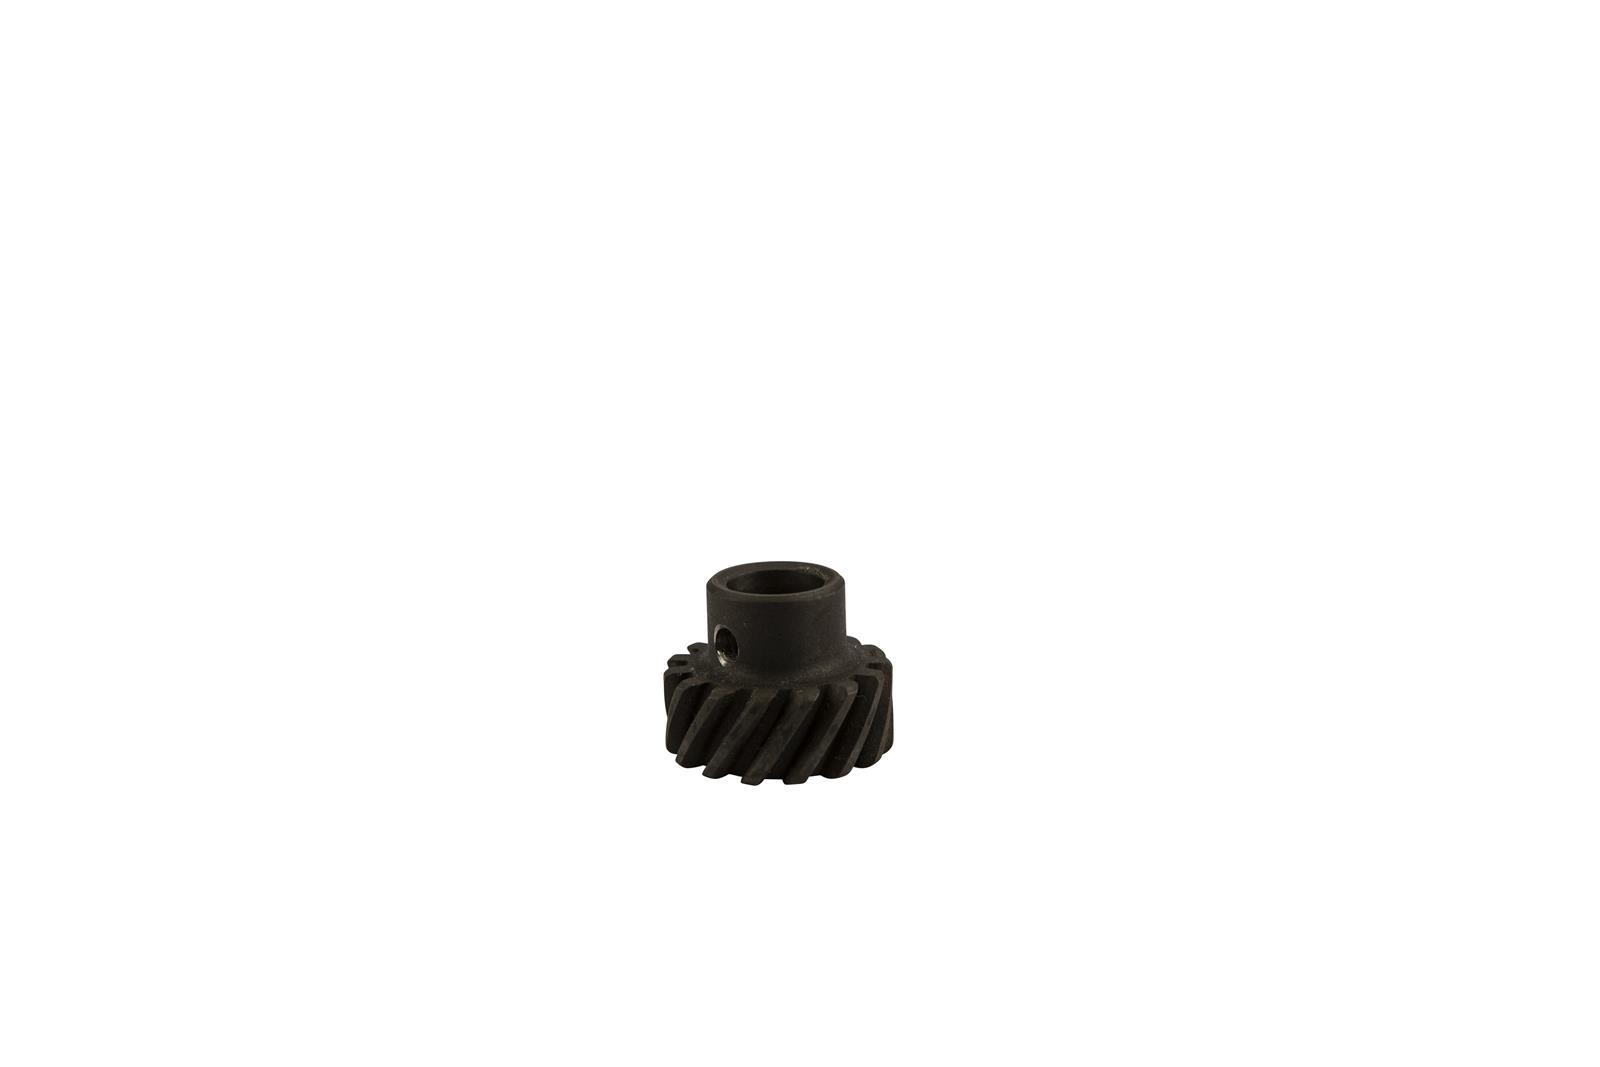 Crane 44970-1 Steel Distributor Gear